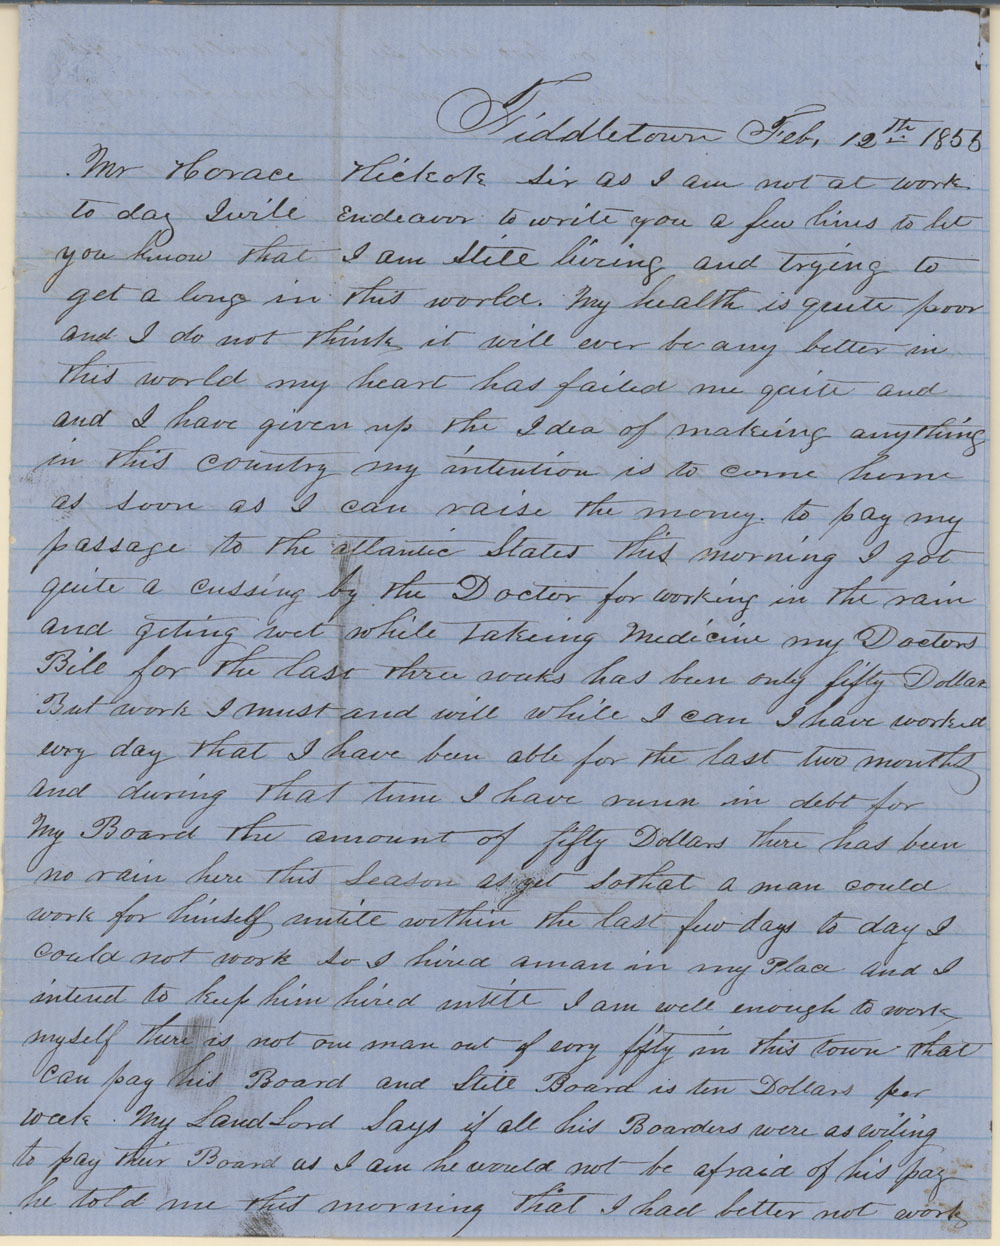 James Butler (Wild Bill) Hickok family collection - February 12, 1855, p1